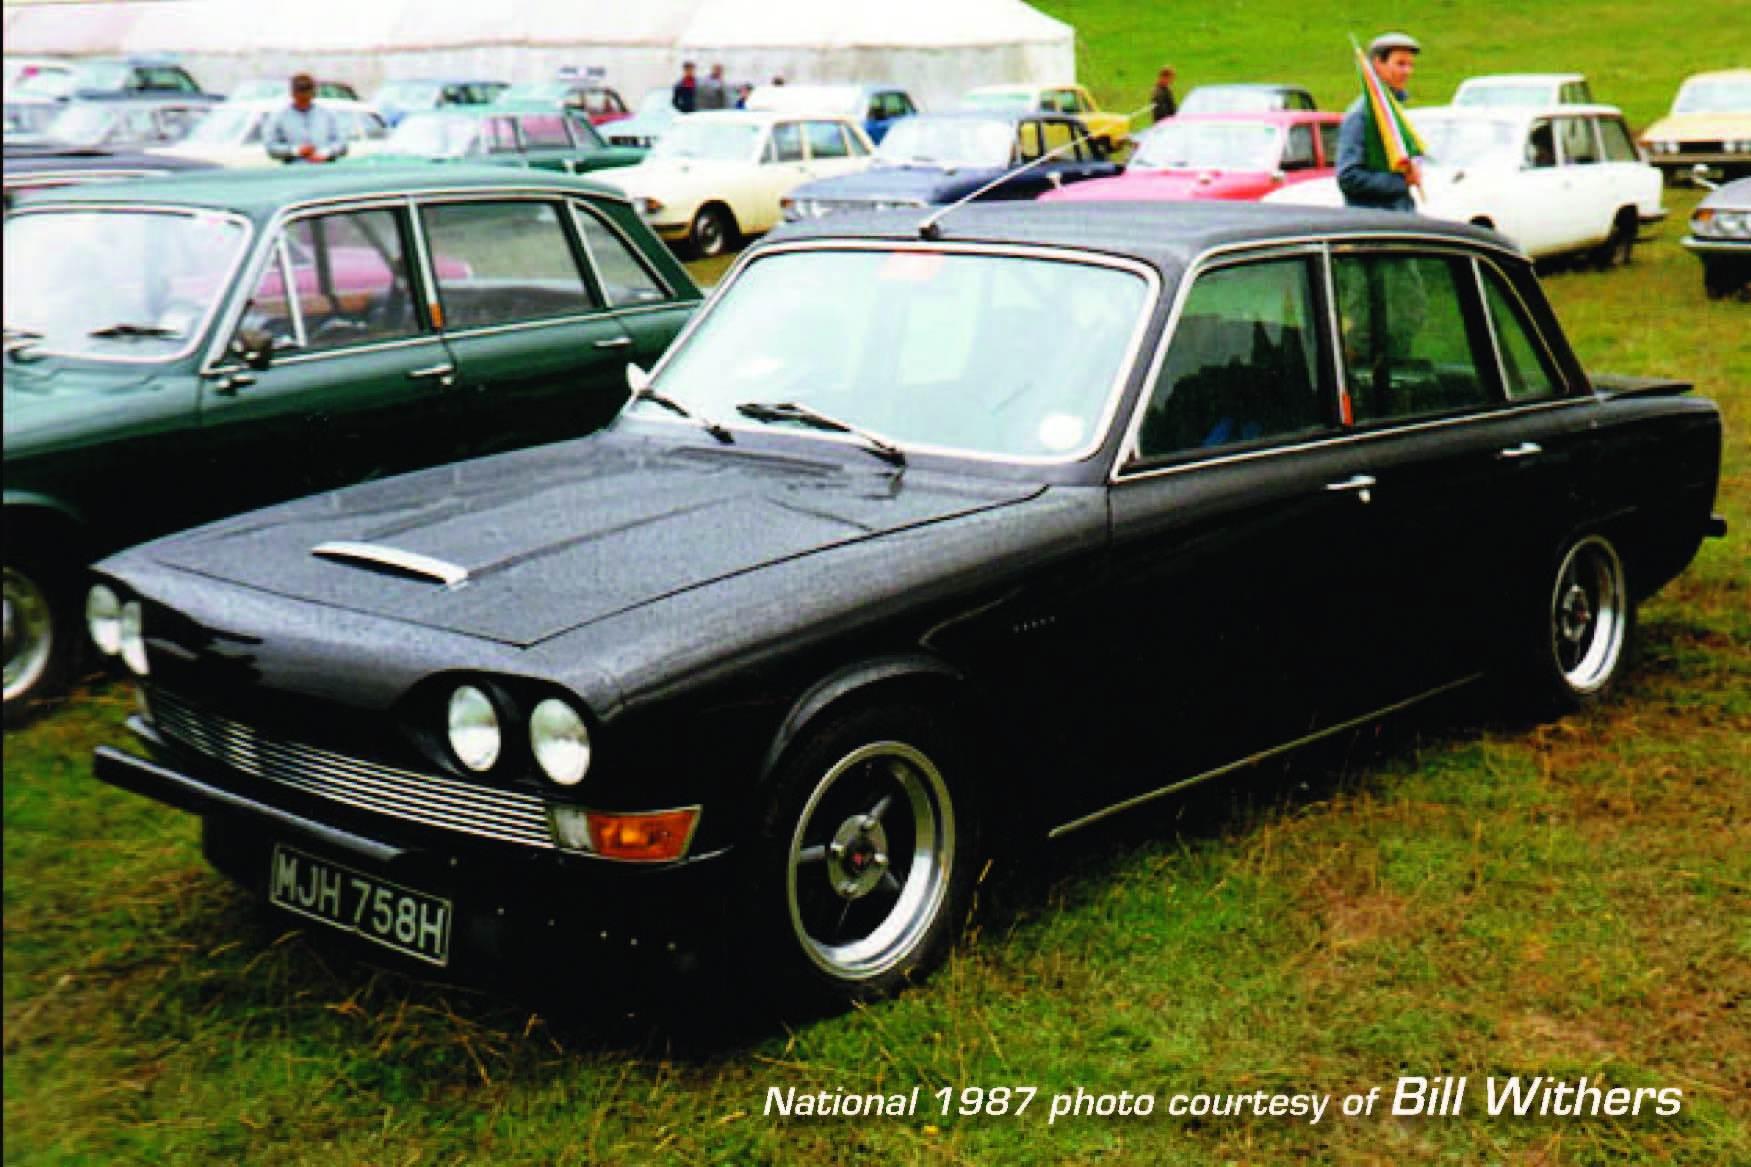 Nat-1987i